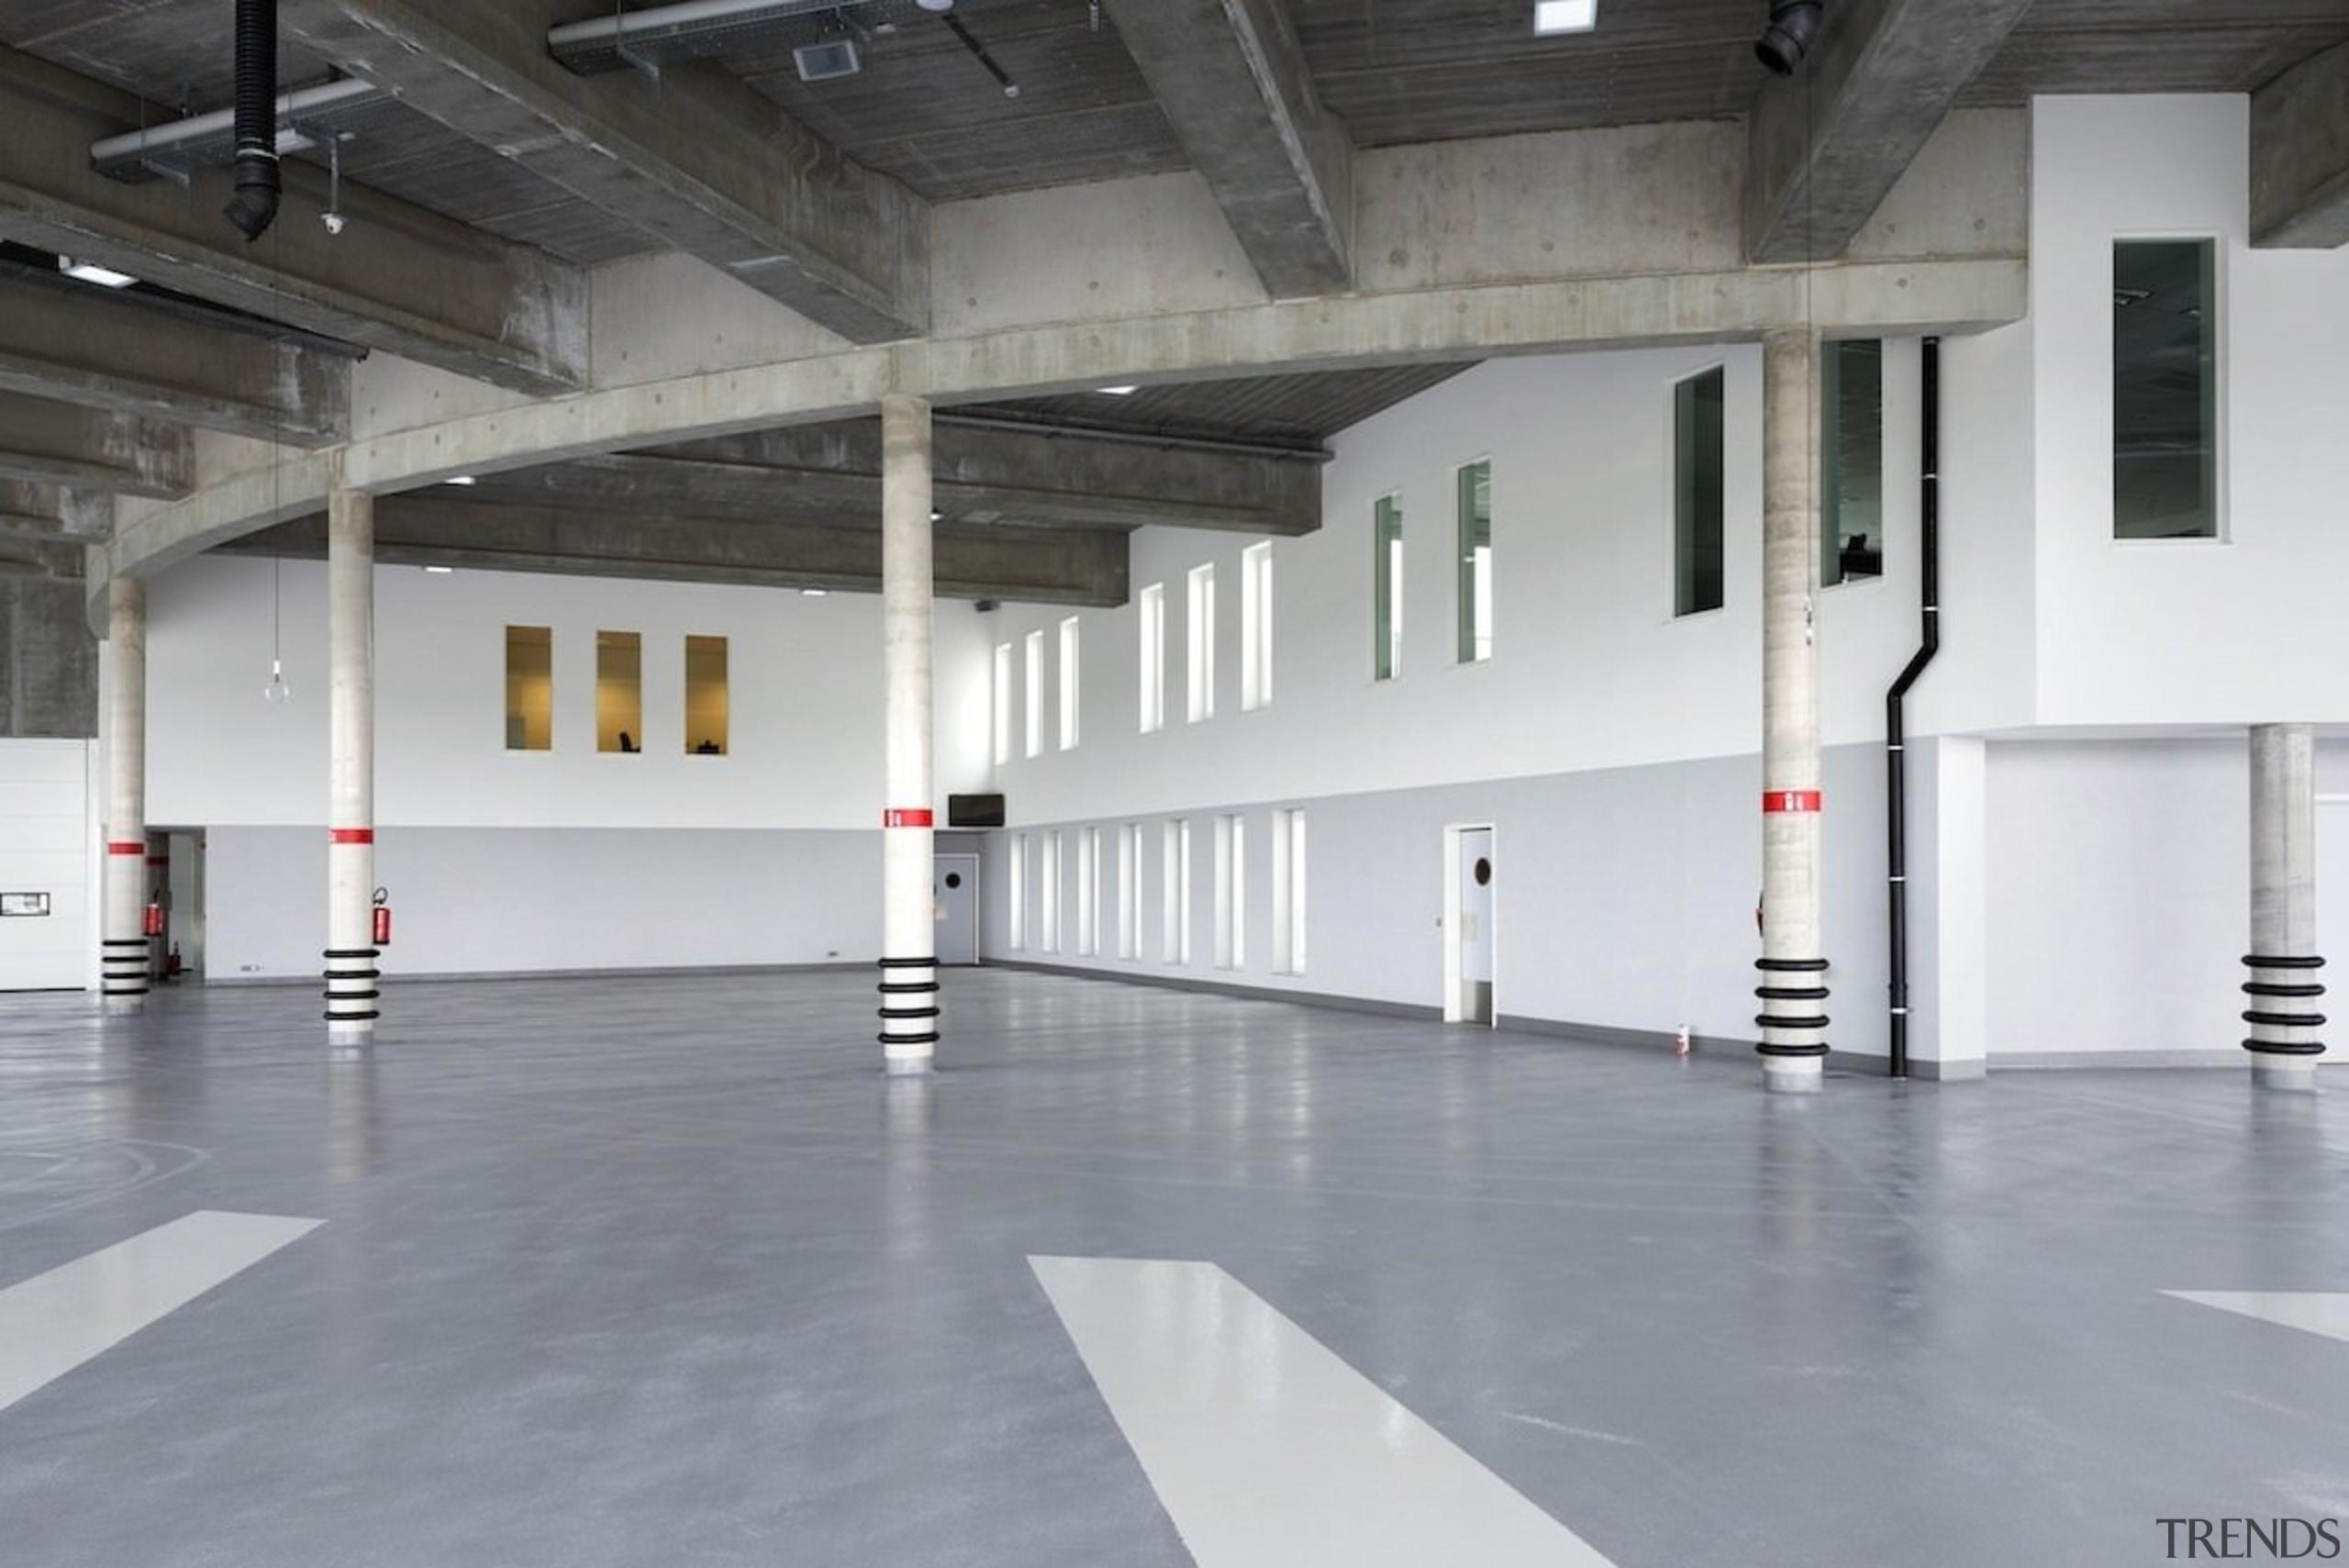 569 firestation - 569 firestation - floor   floor, flooring, structure, gray